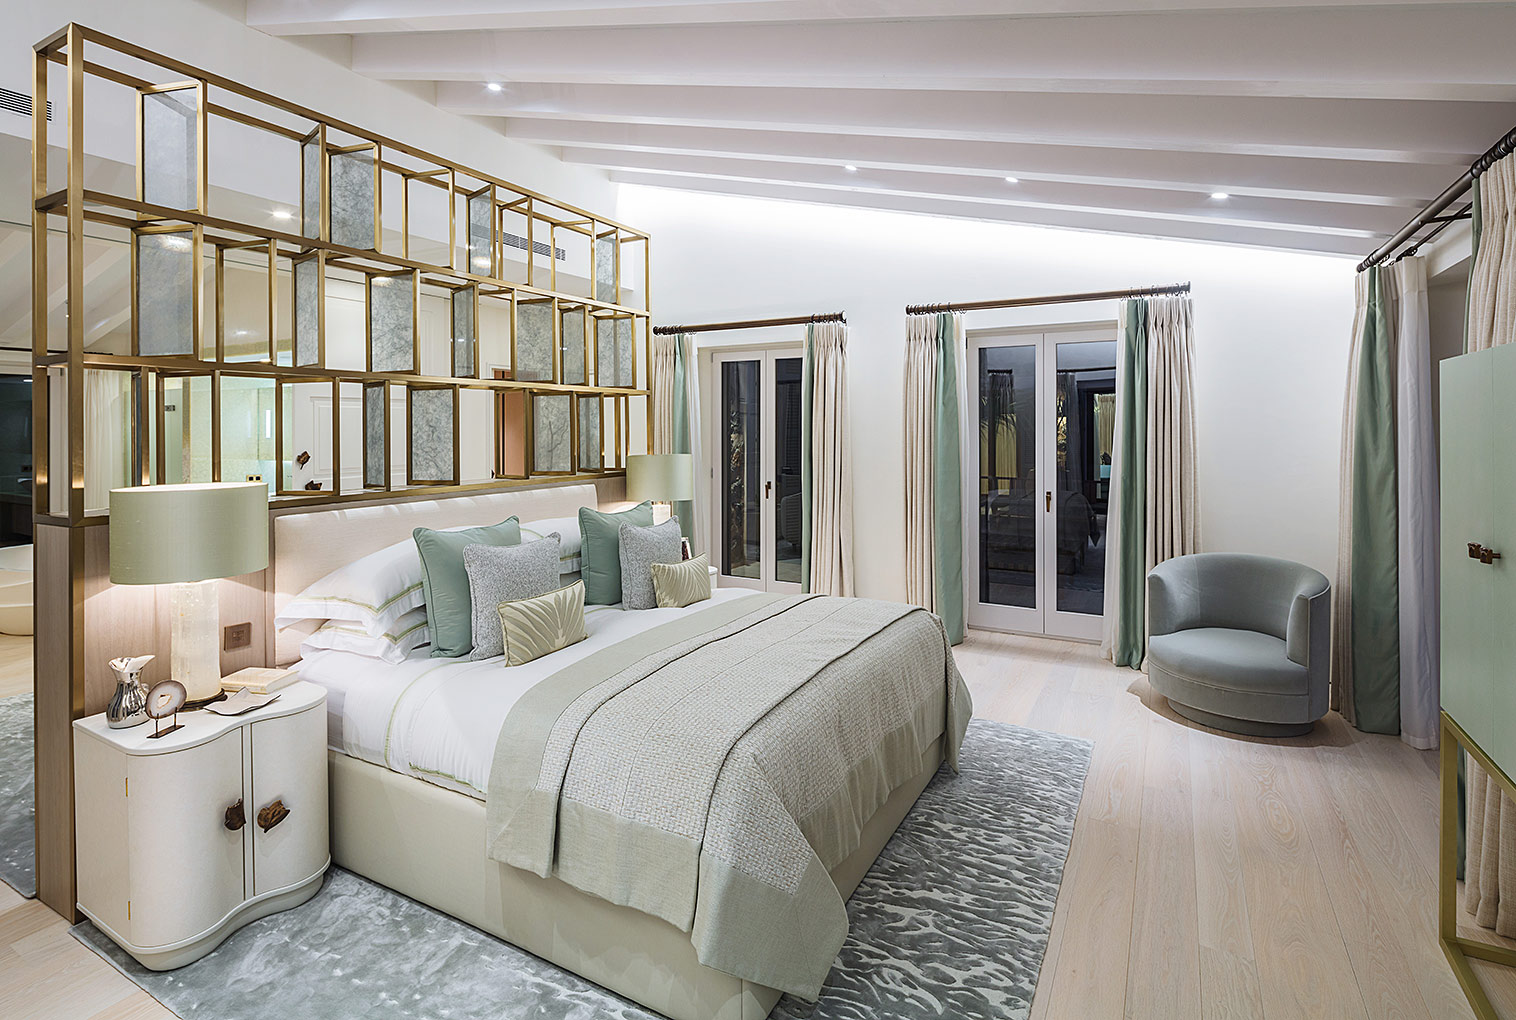 architecture and interior photograph - Immobilienfotografie auf Mallorca